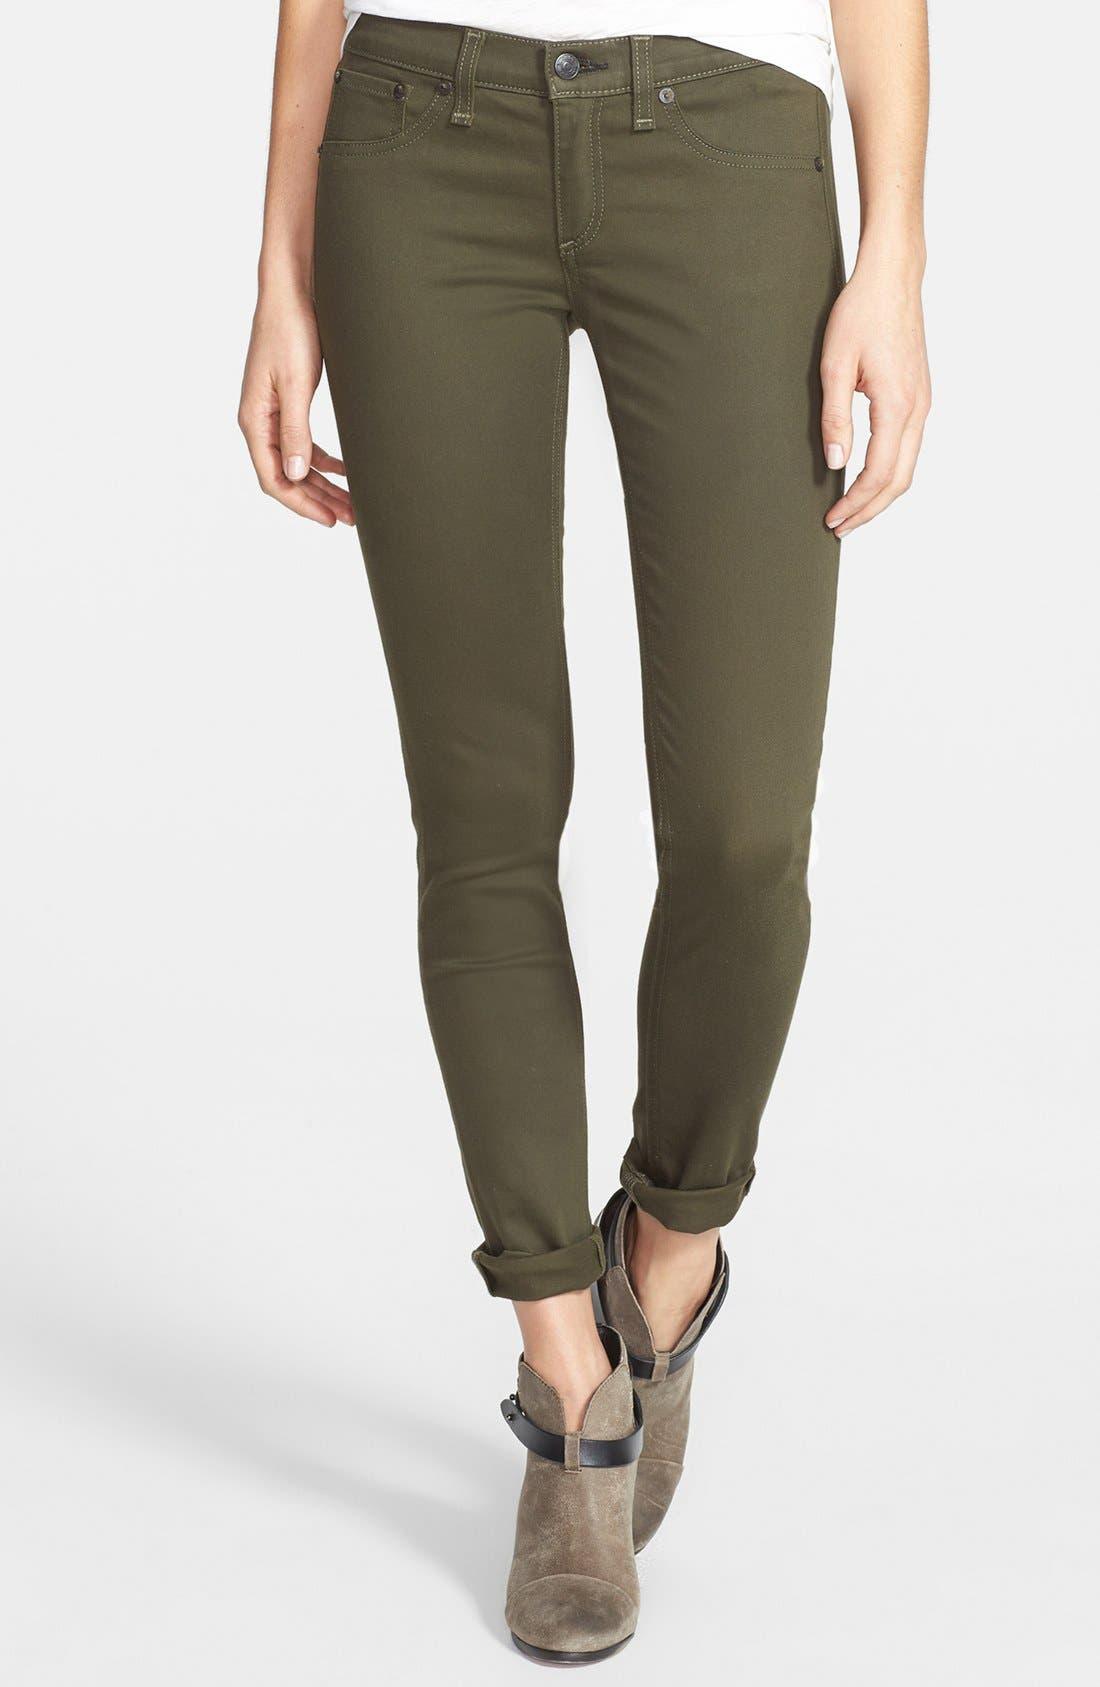 Main Image - rag & bone/JEAN 'The Legging' Sateen Skinny Jeans (Army Sateen)